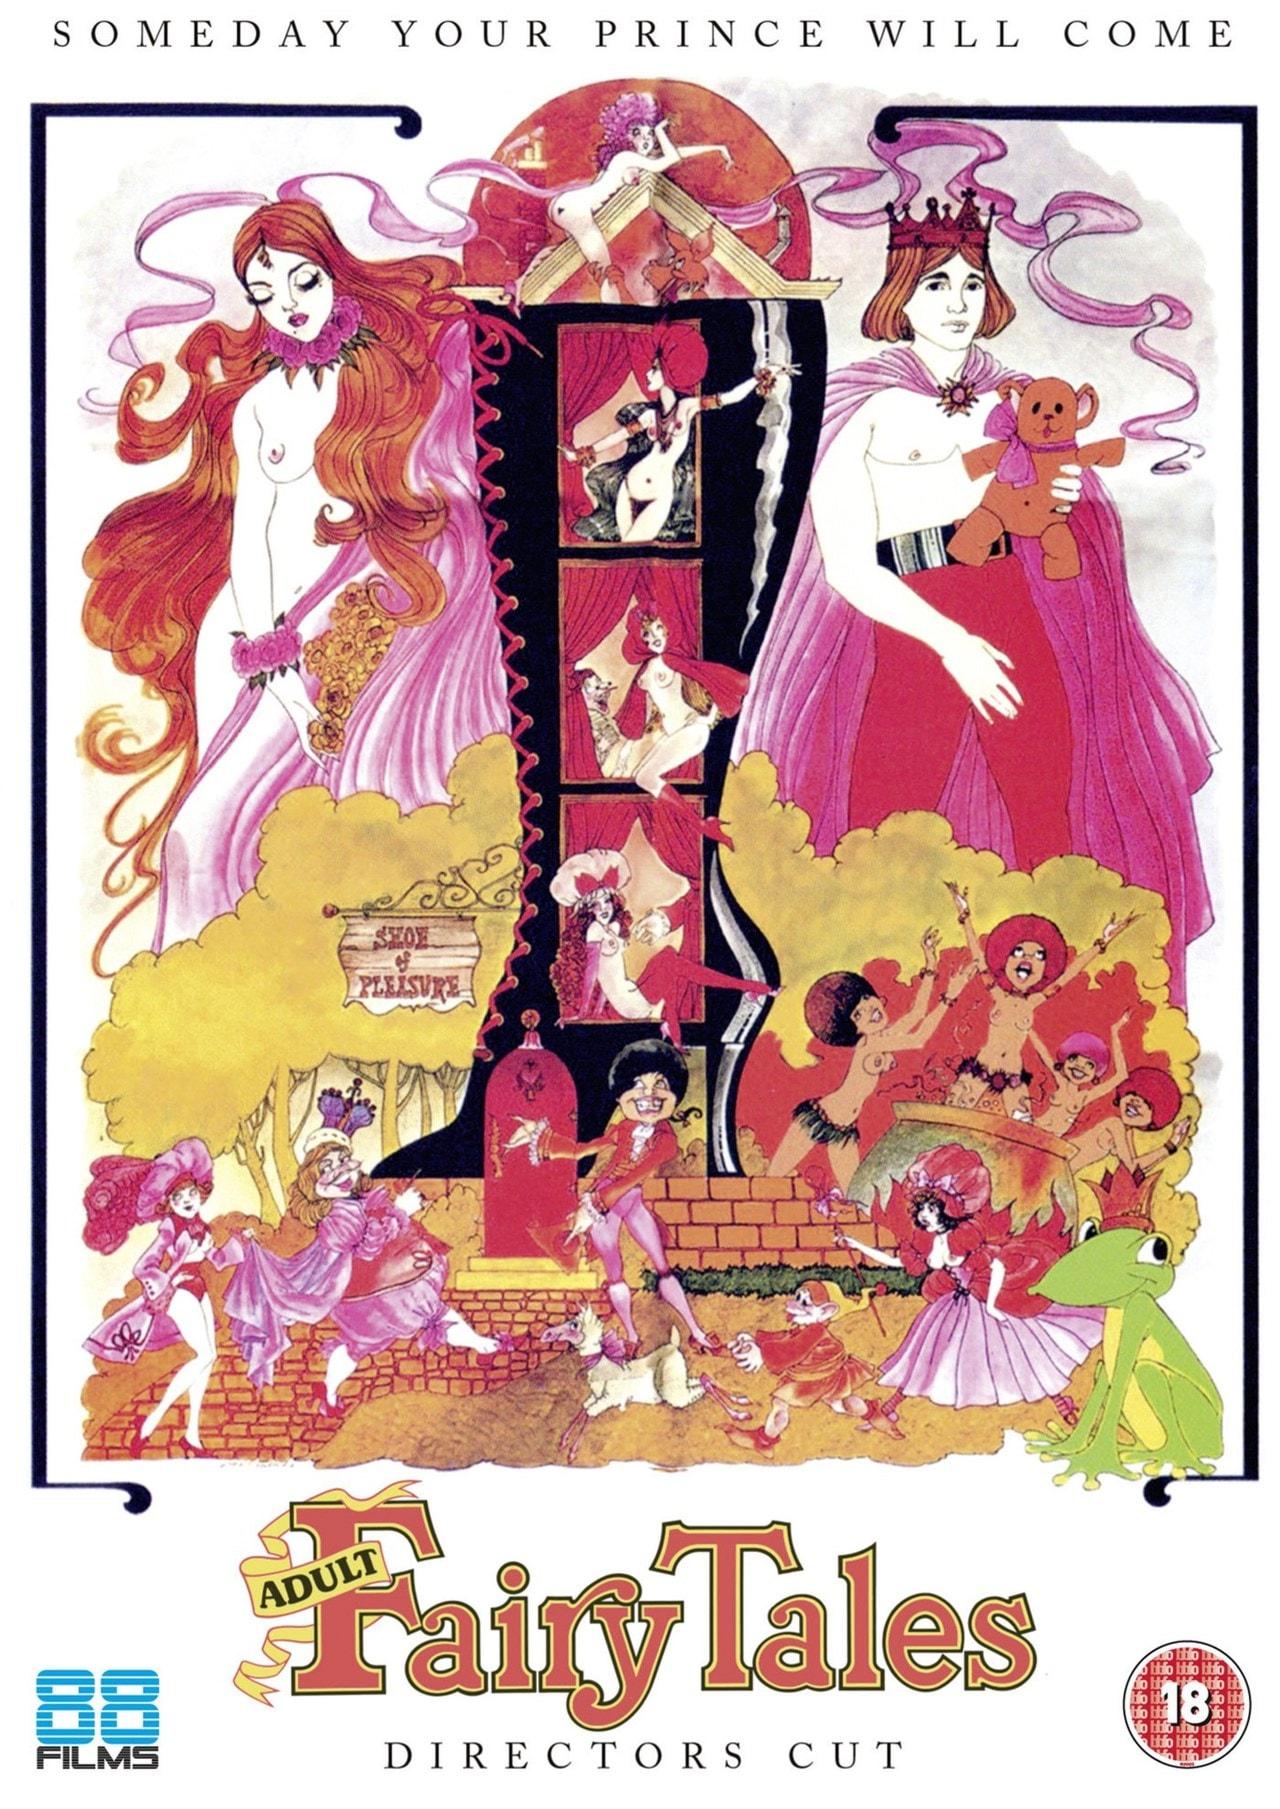 Adult Fairy Tales: Director's Cut - 1